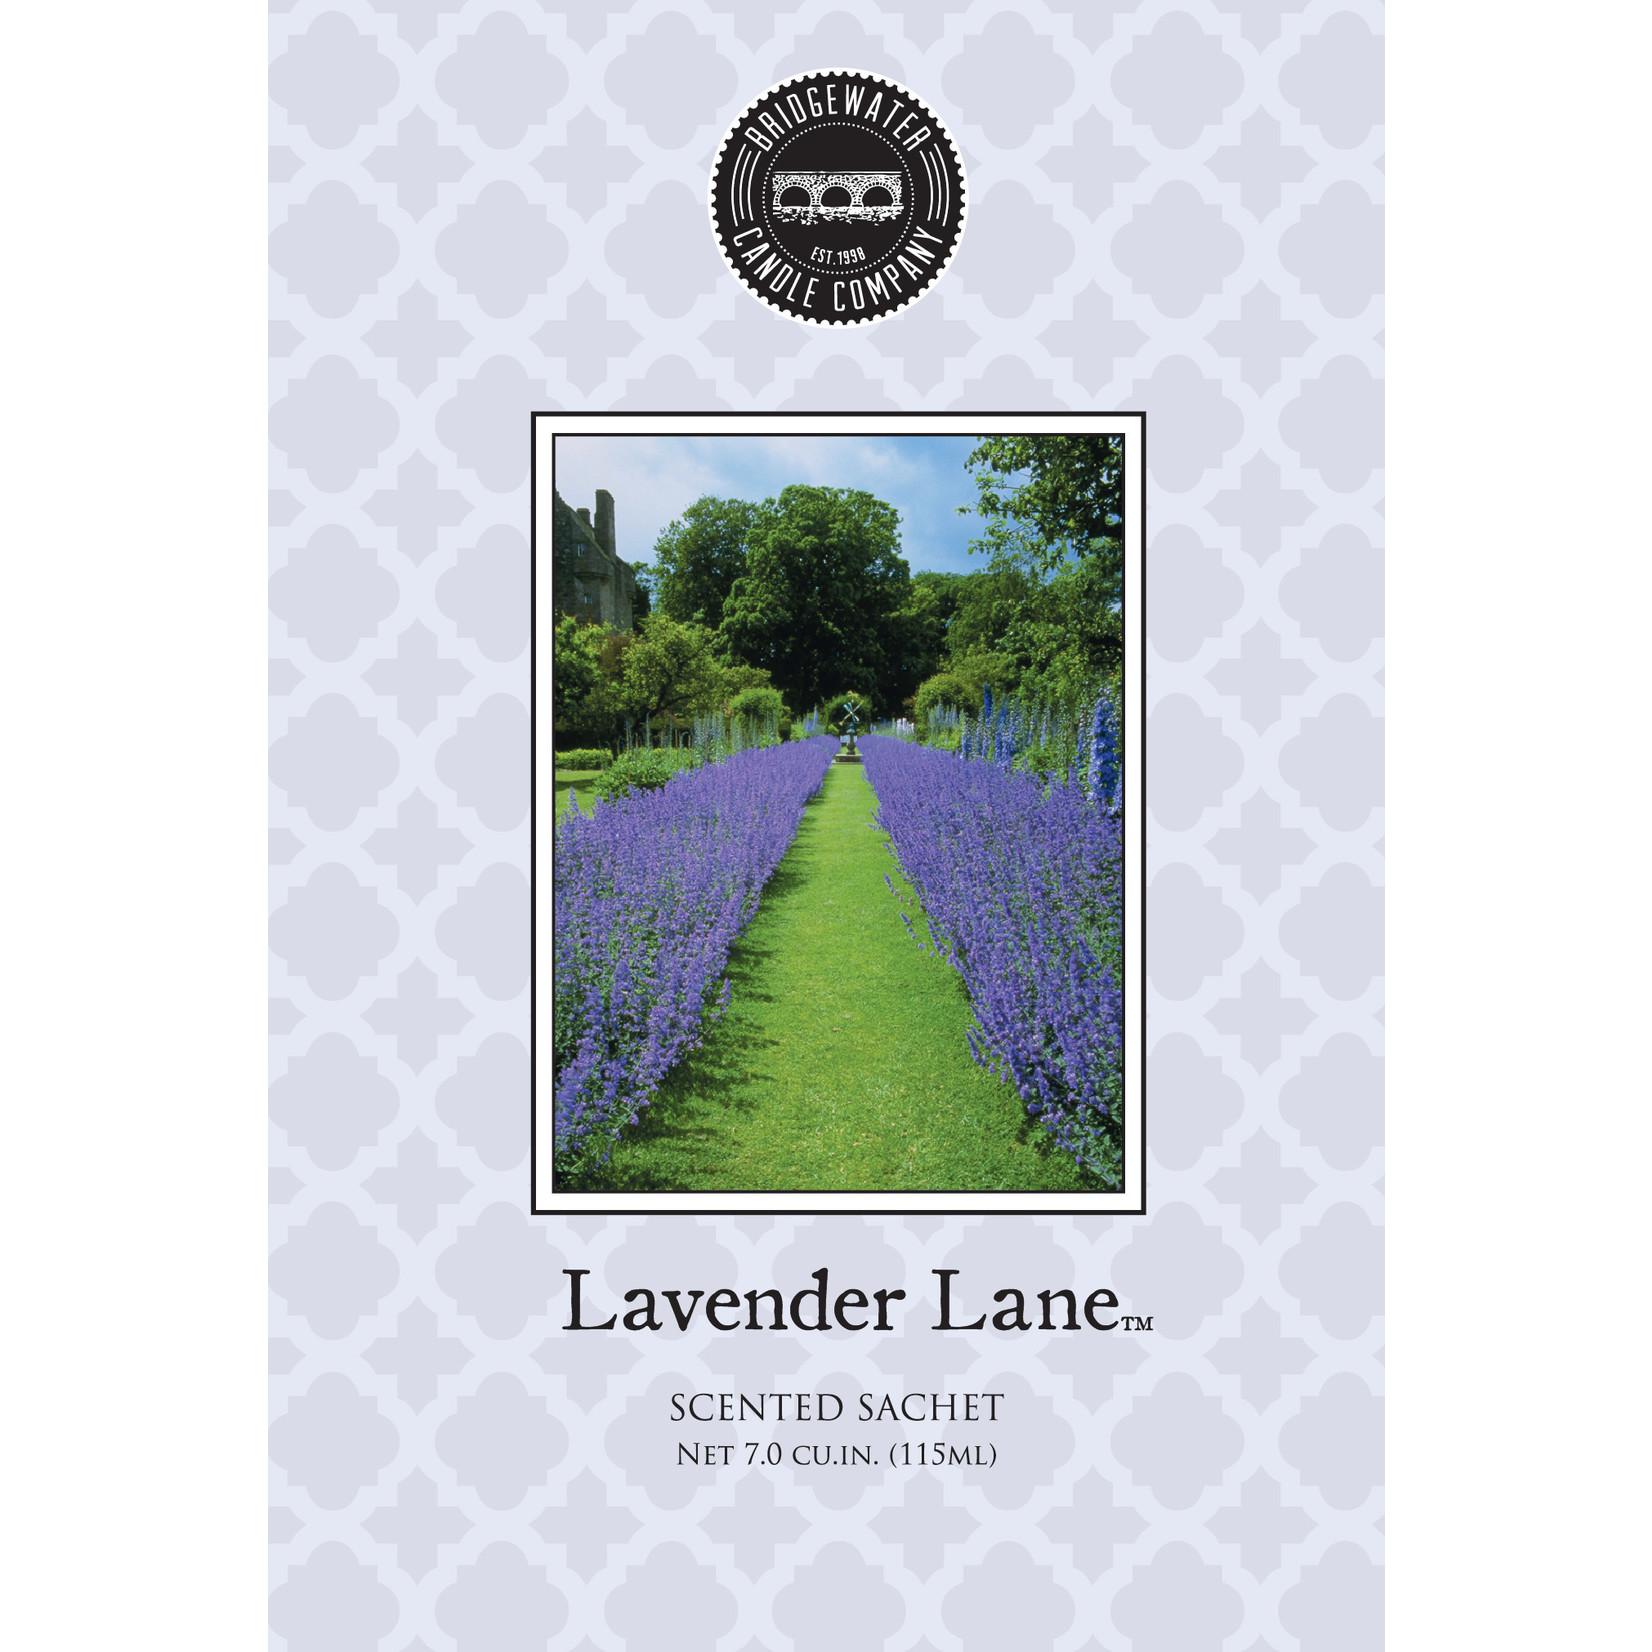 Bridgewater Scented Sachet / Geurzakje Lavender Lane